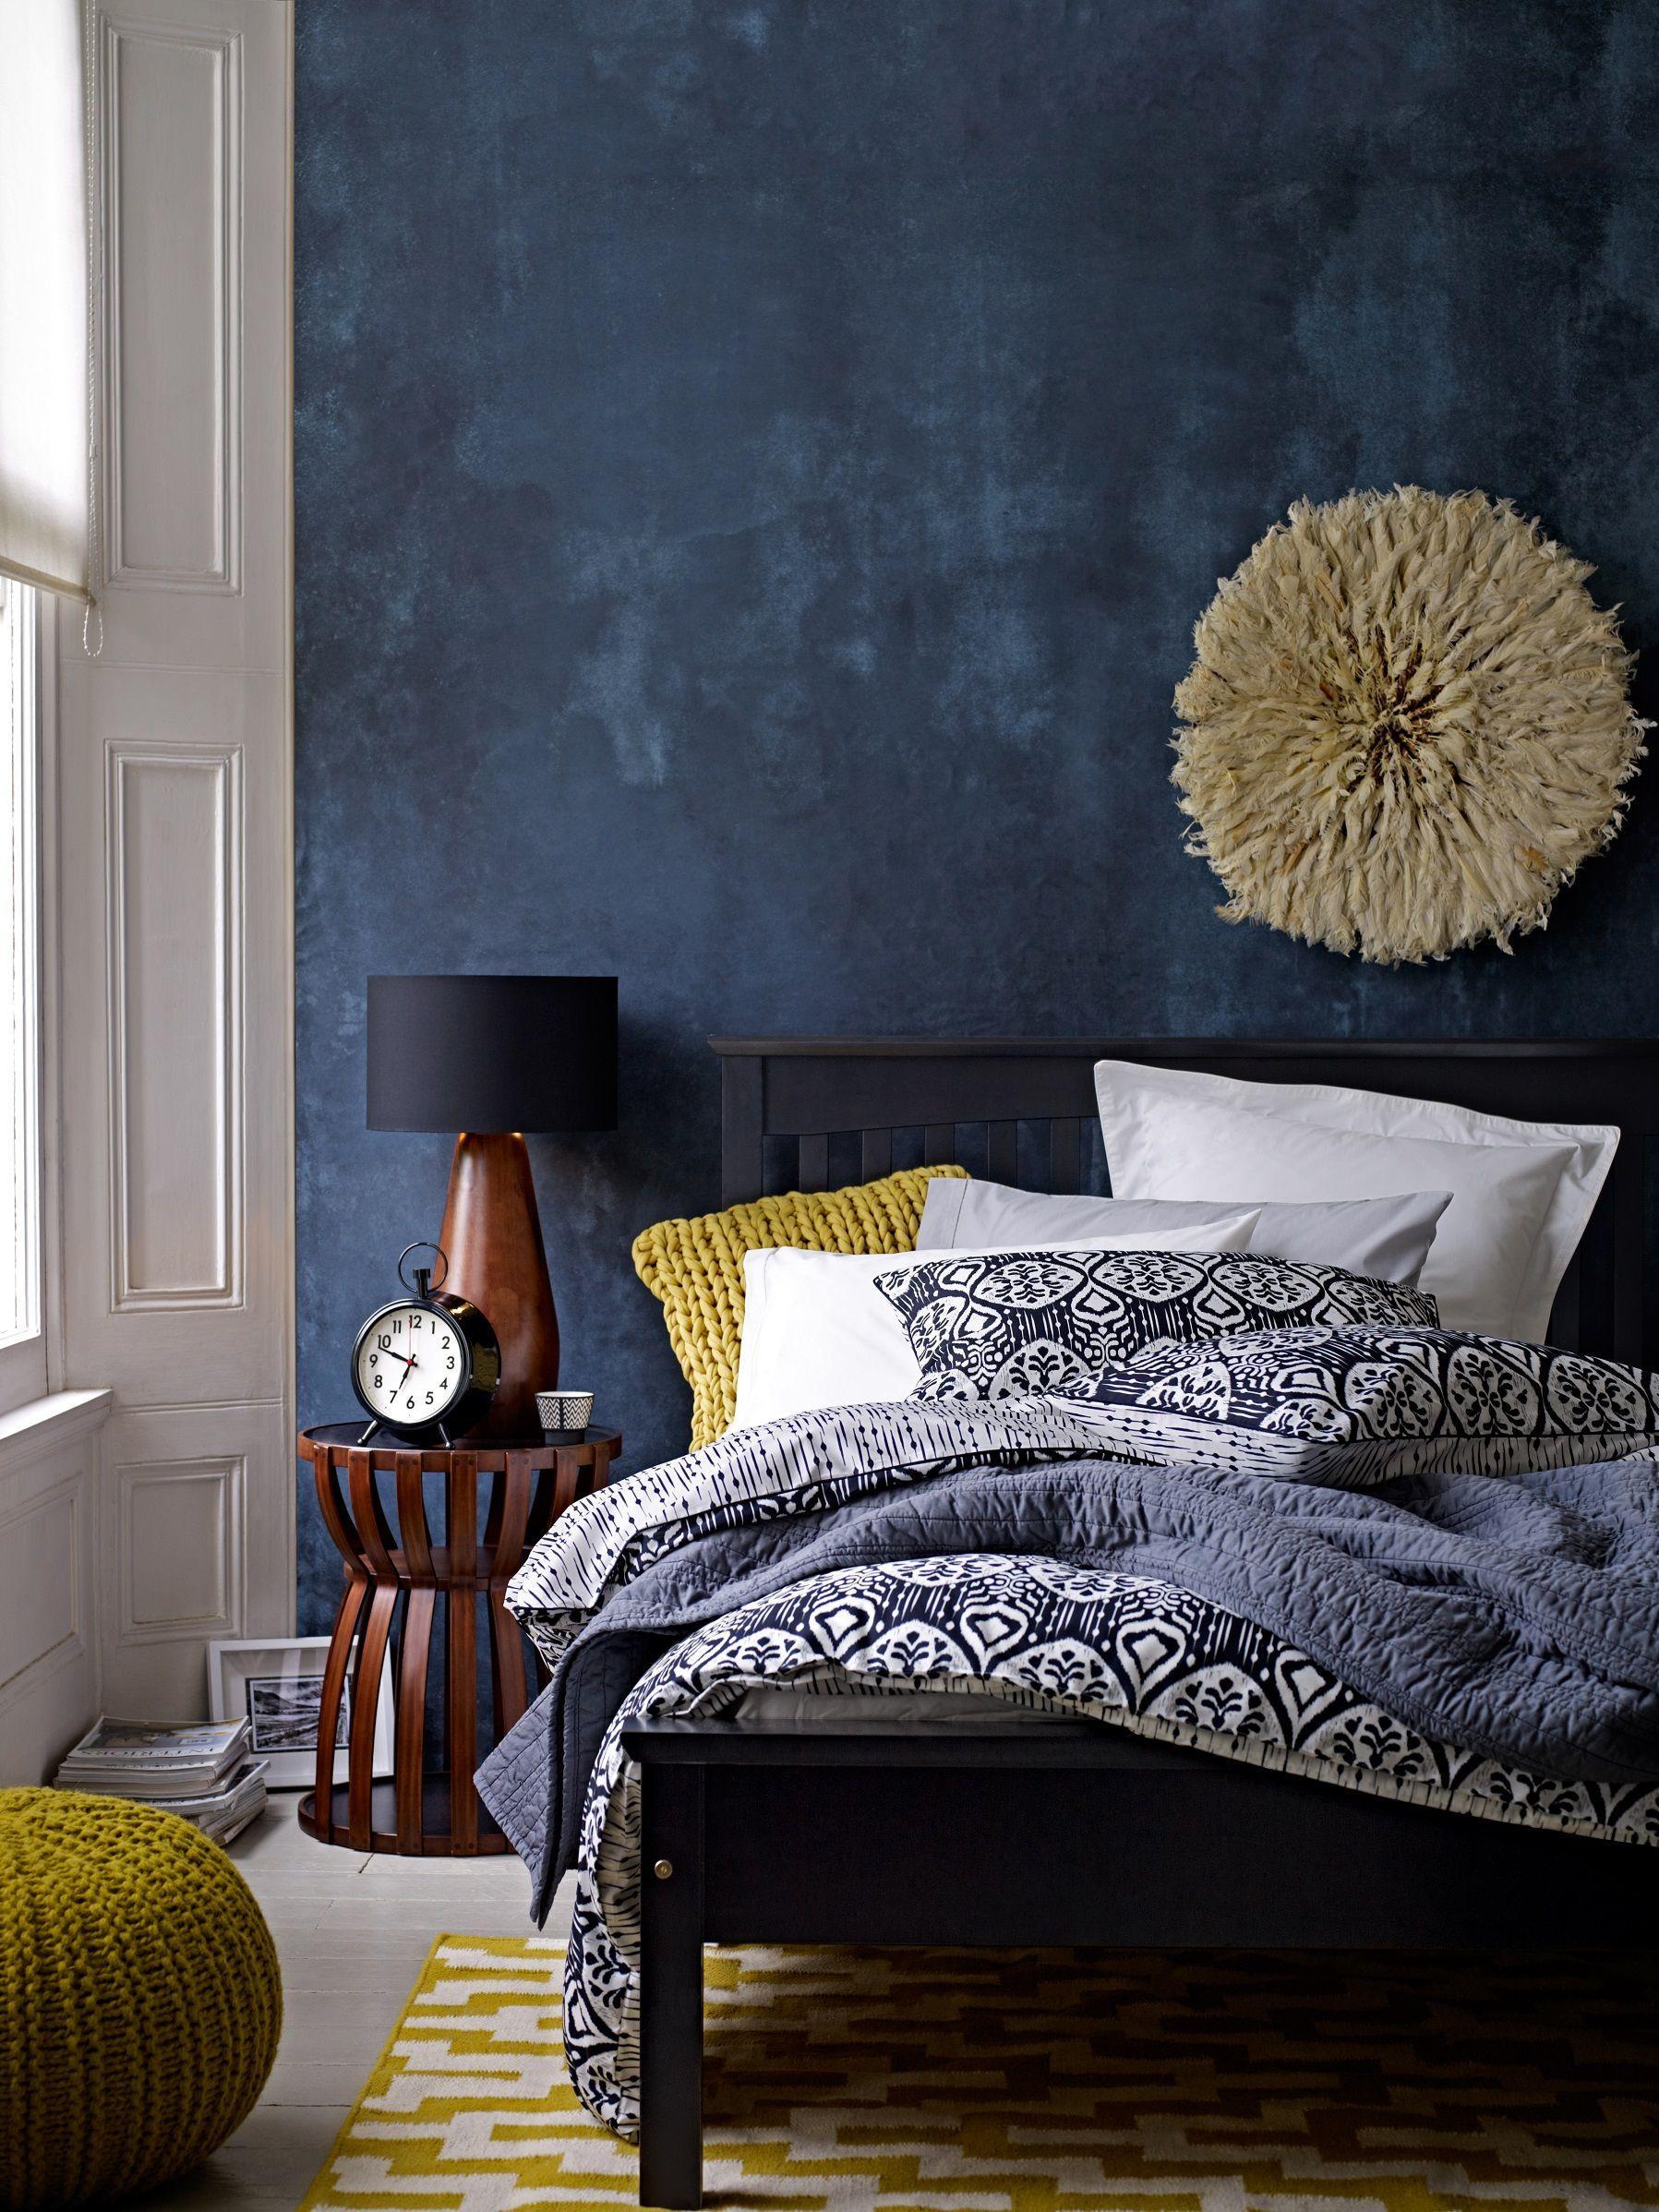 Image result for Texture walls:blue grey bedroom pinterest